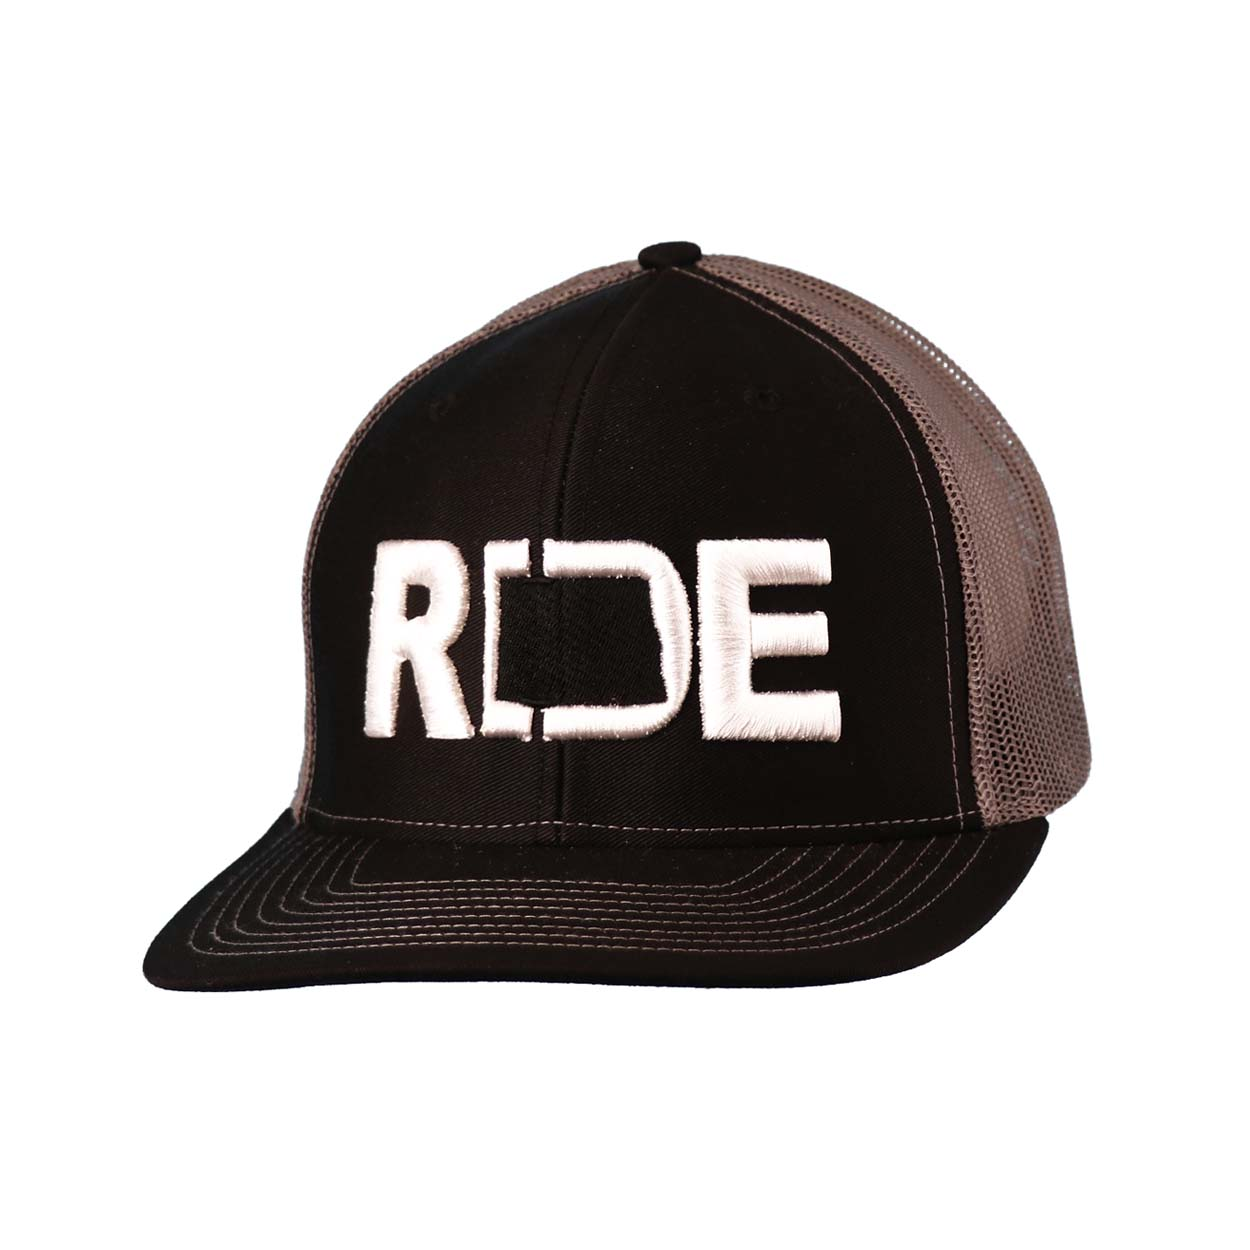 Ride North Dakota Classic Embroidered Snapback Trucker Hat Black/White